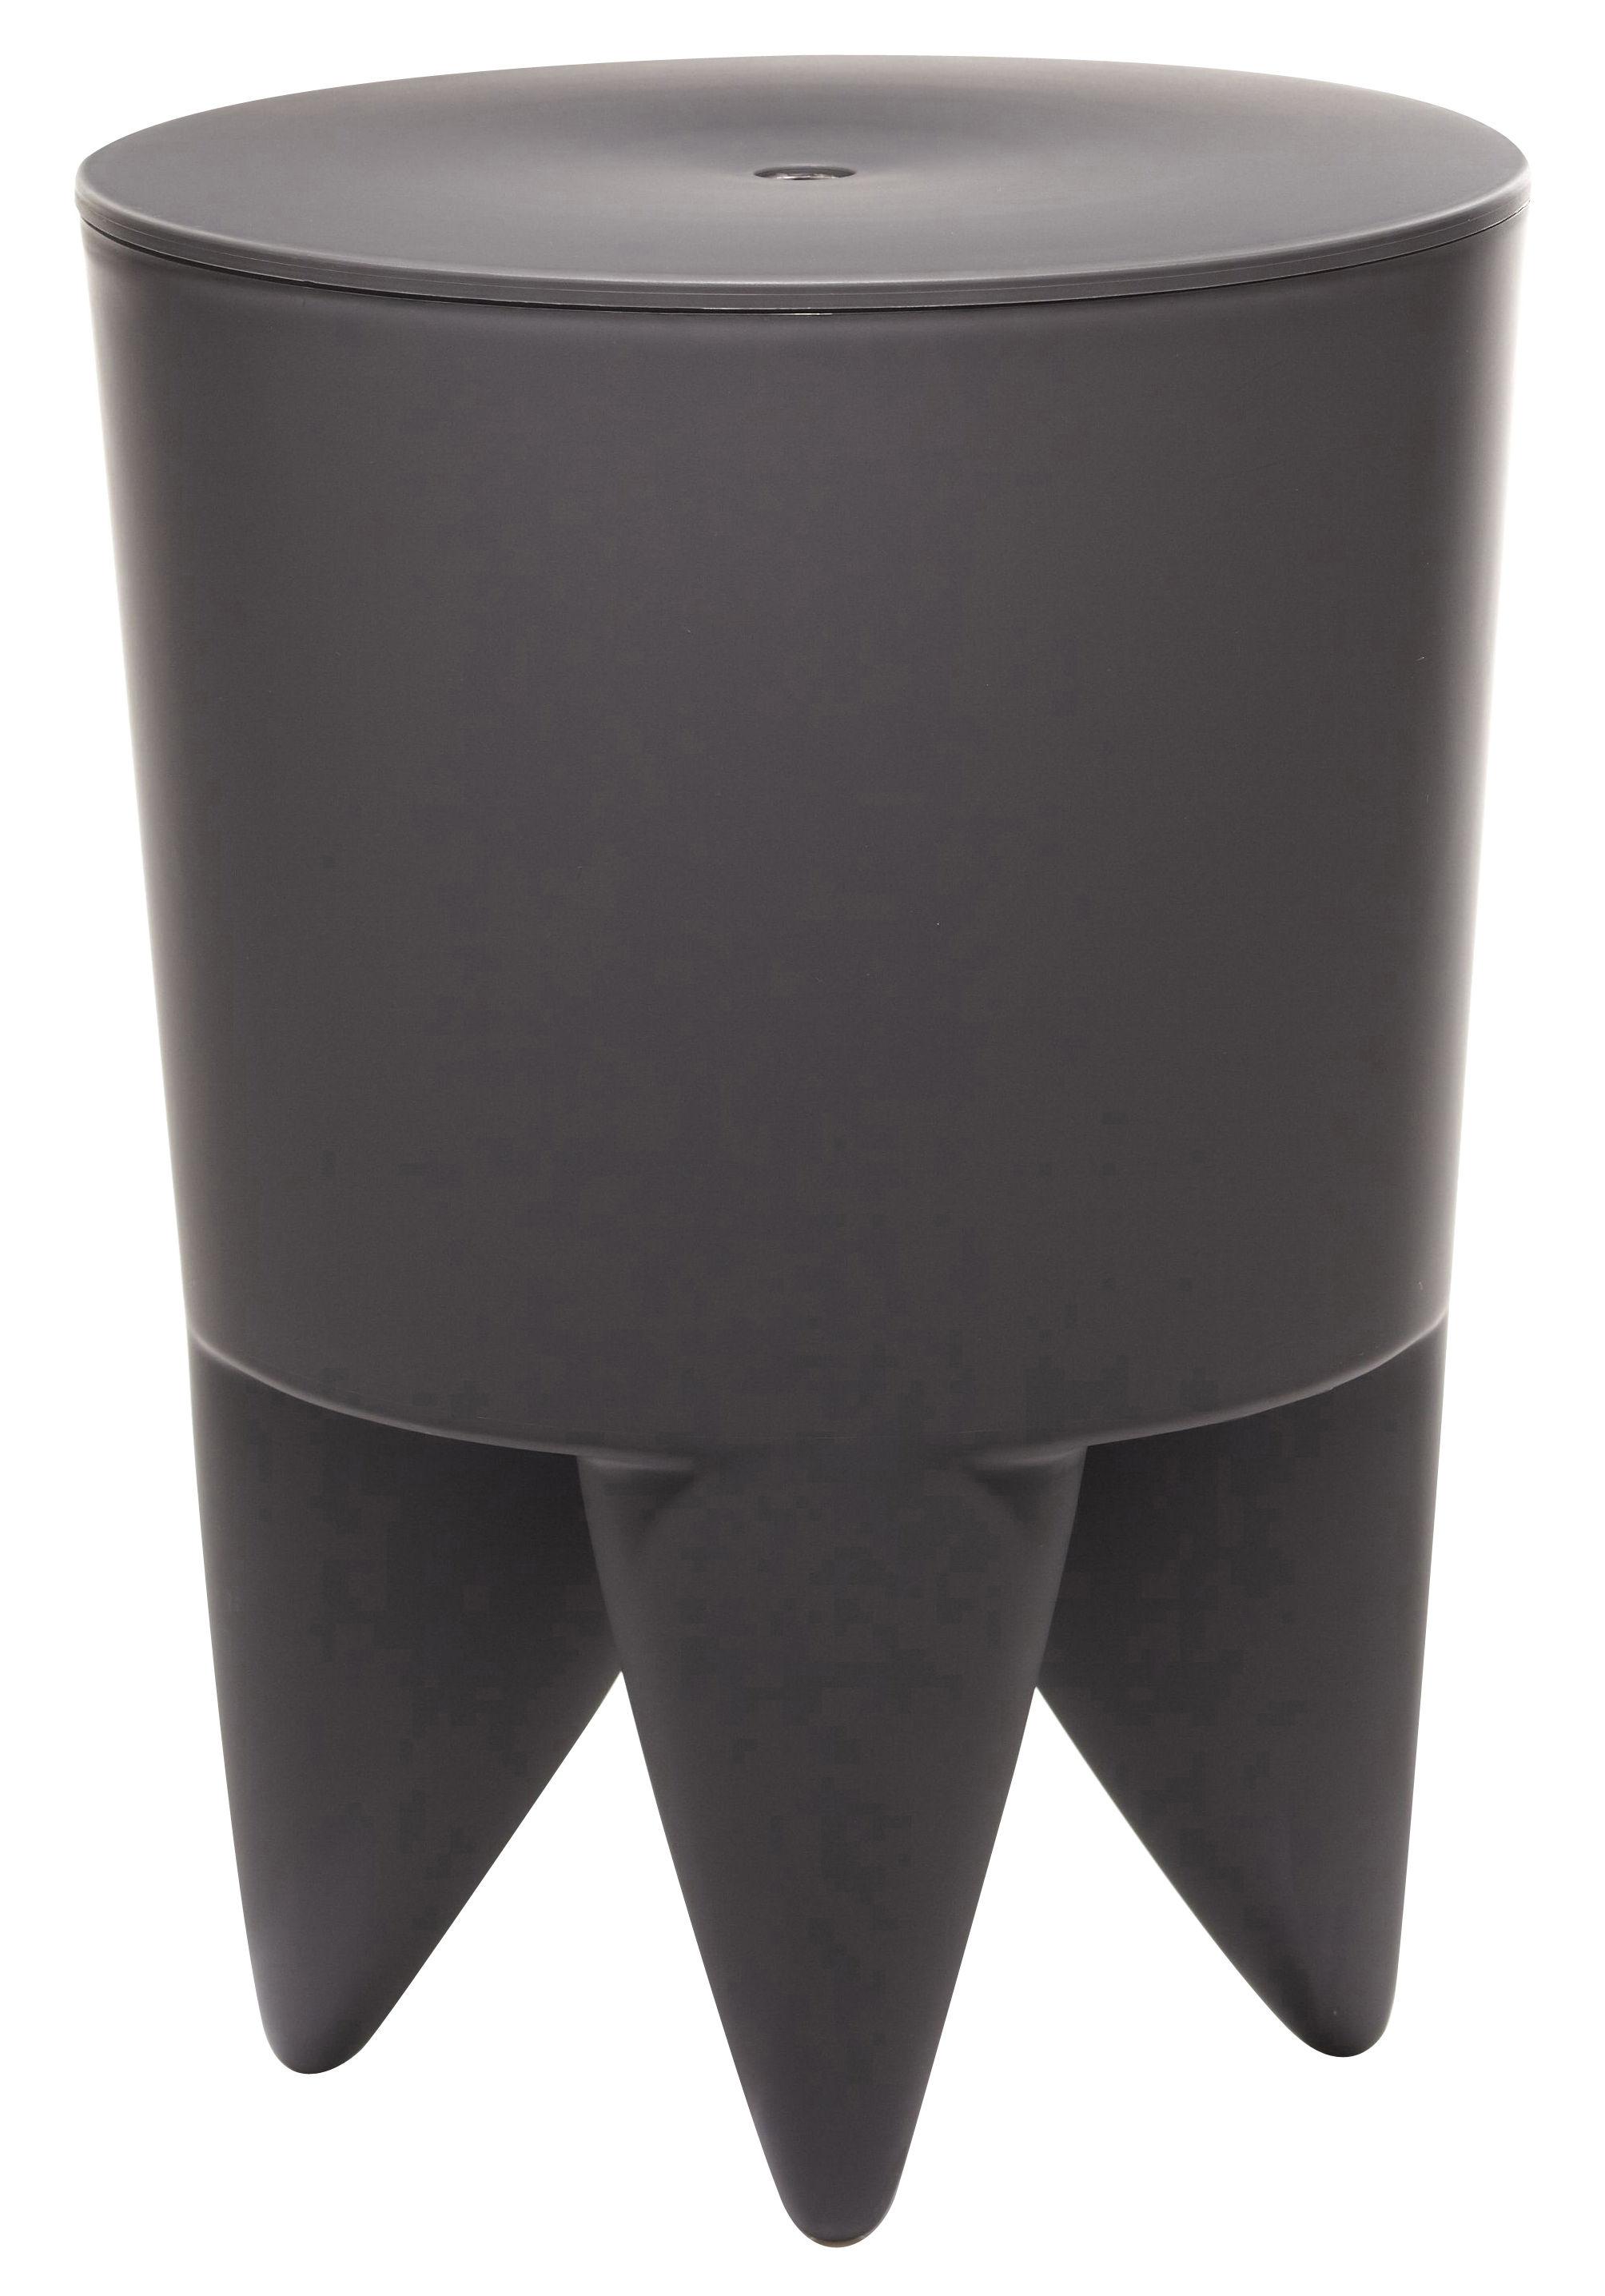 tabouret new bubu 1er coffre plastique gris charbon xo. Black Bedroom Furniture Sets. Home Design Ideas